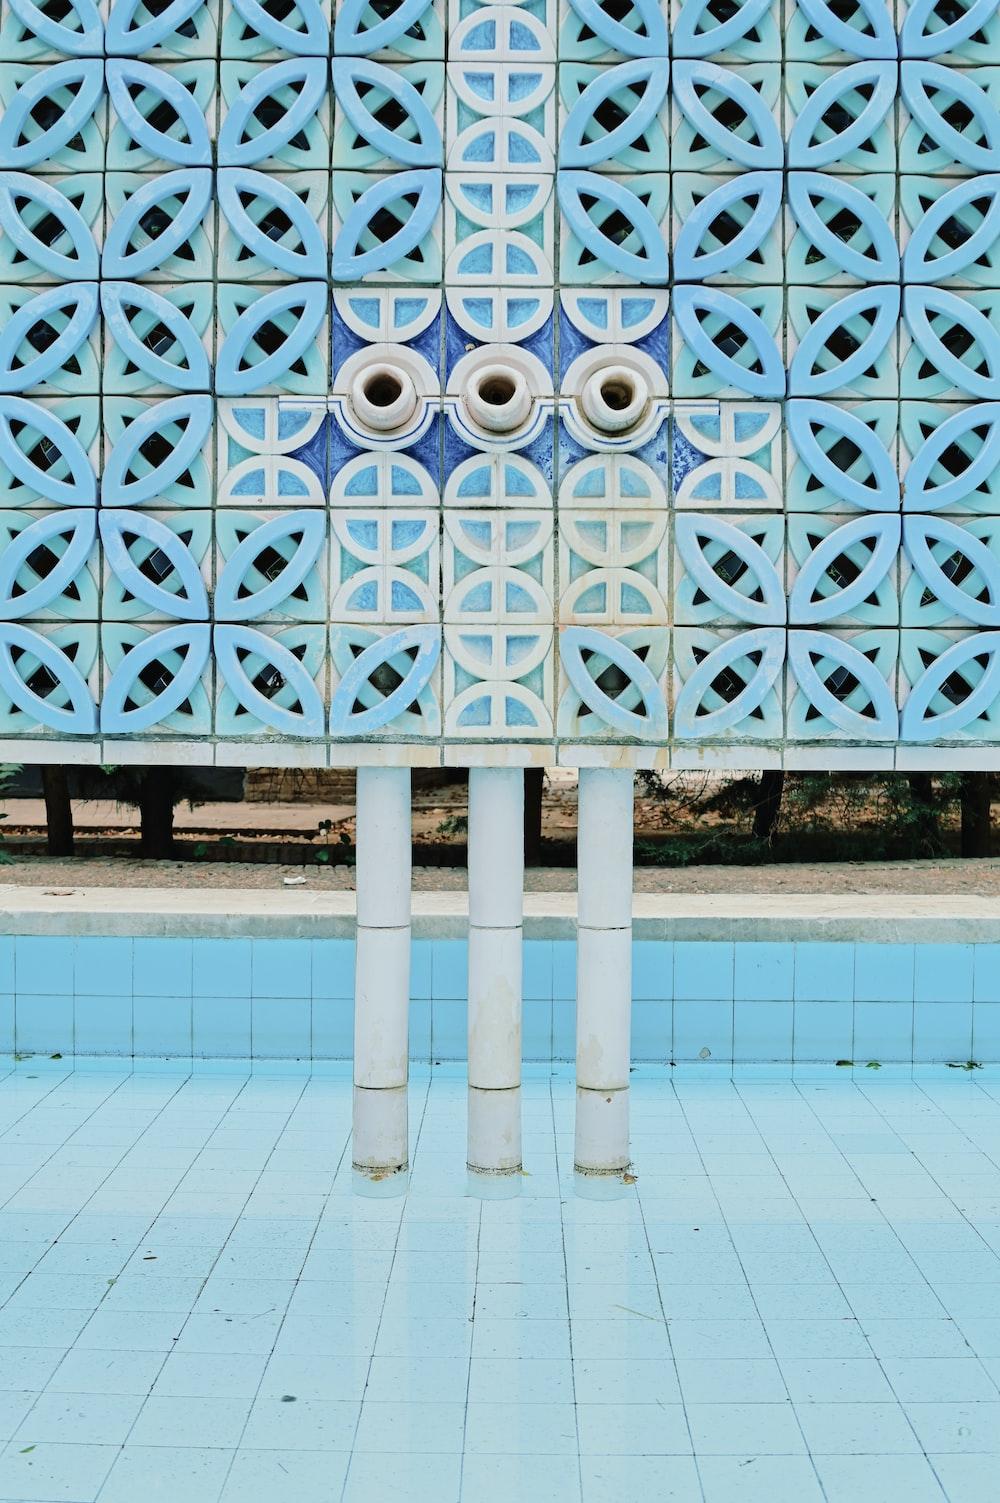 blue and white floral concrete building